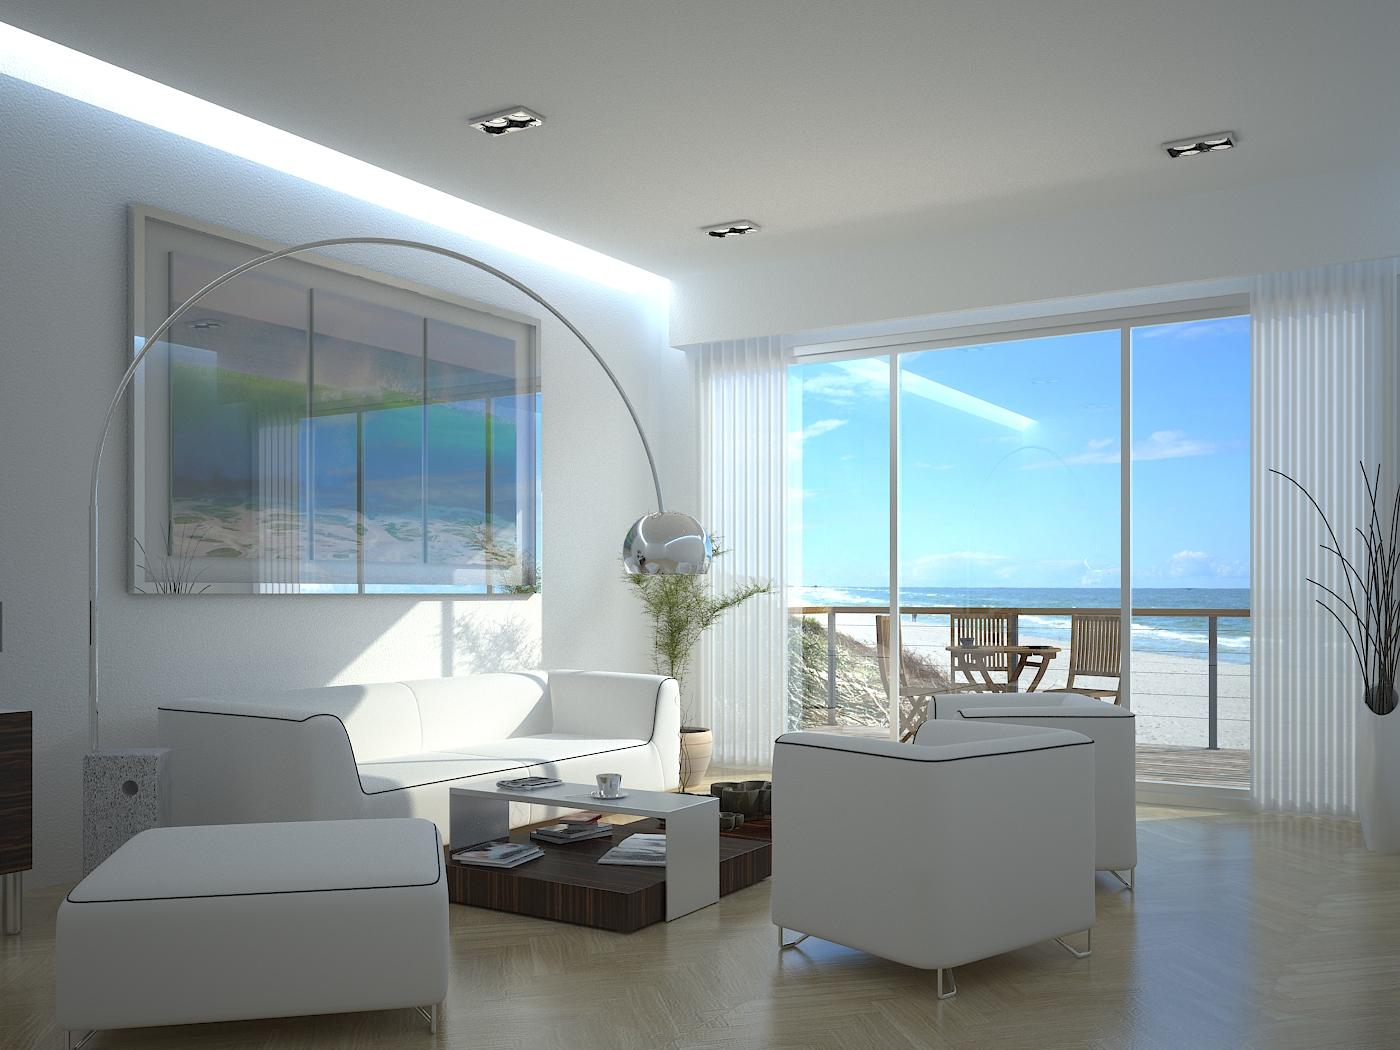 Ocean Themed Bathroom Ideas New Beach House Interior By Outboxdesign On Deviantart